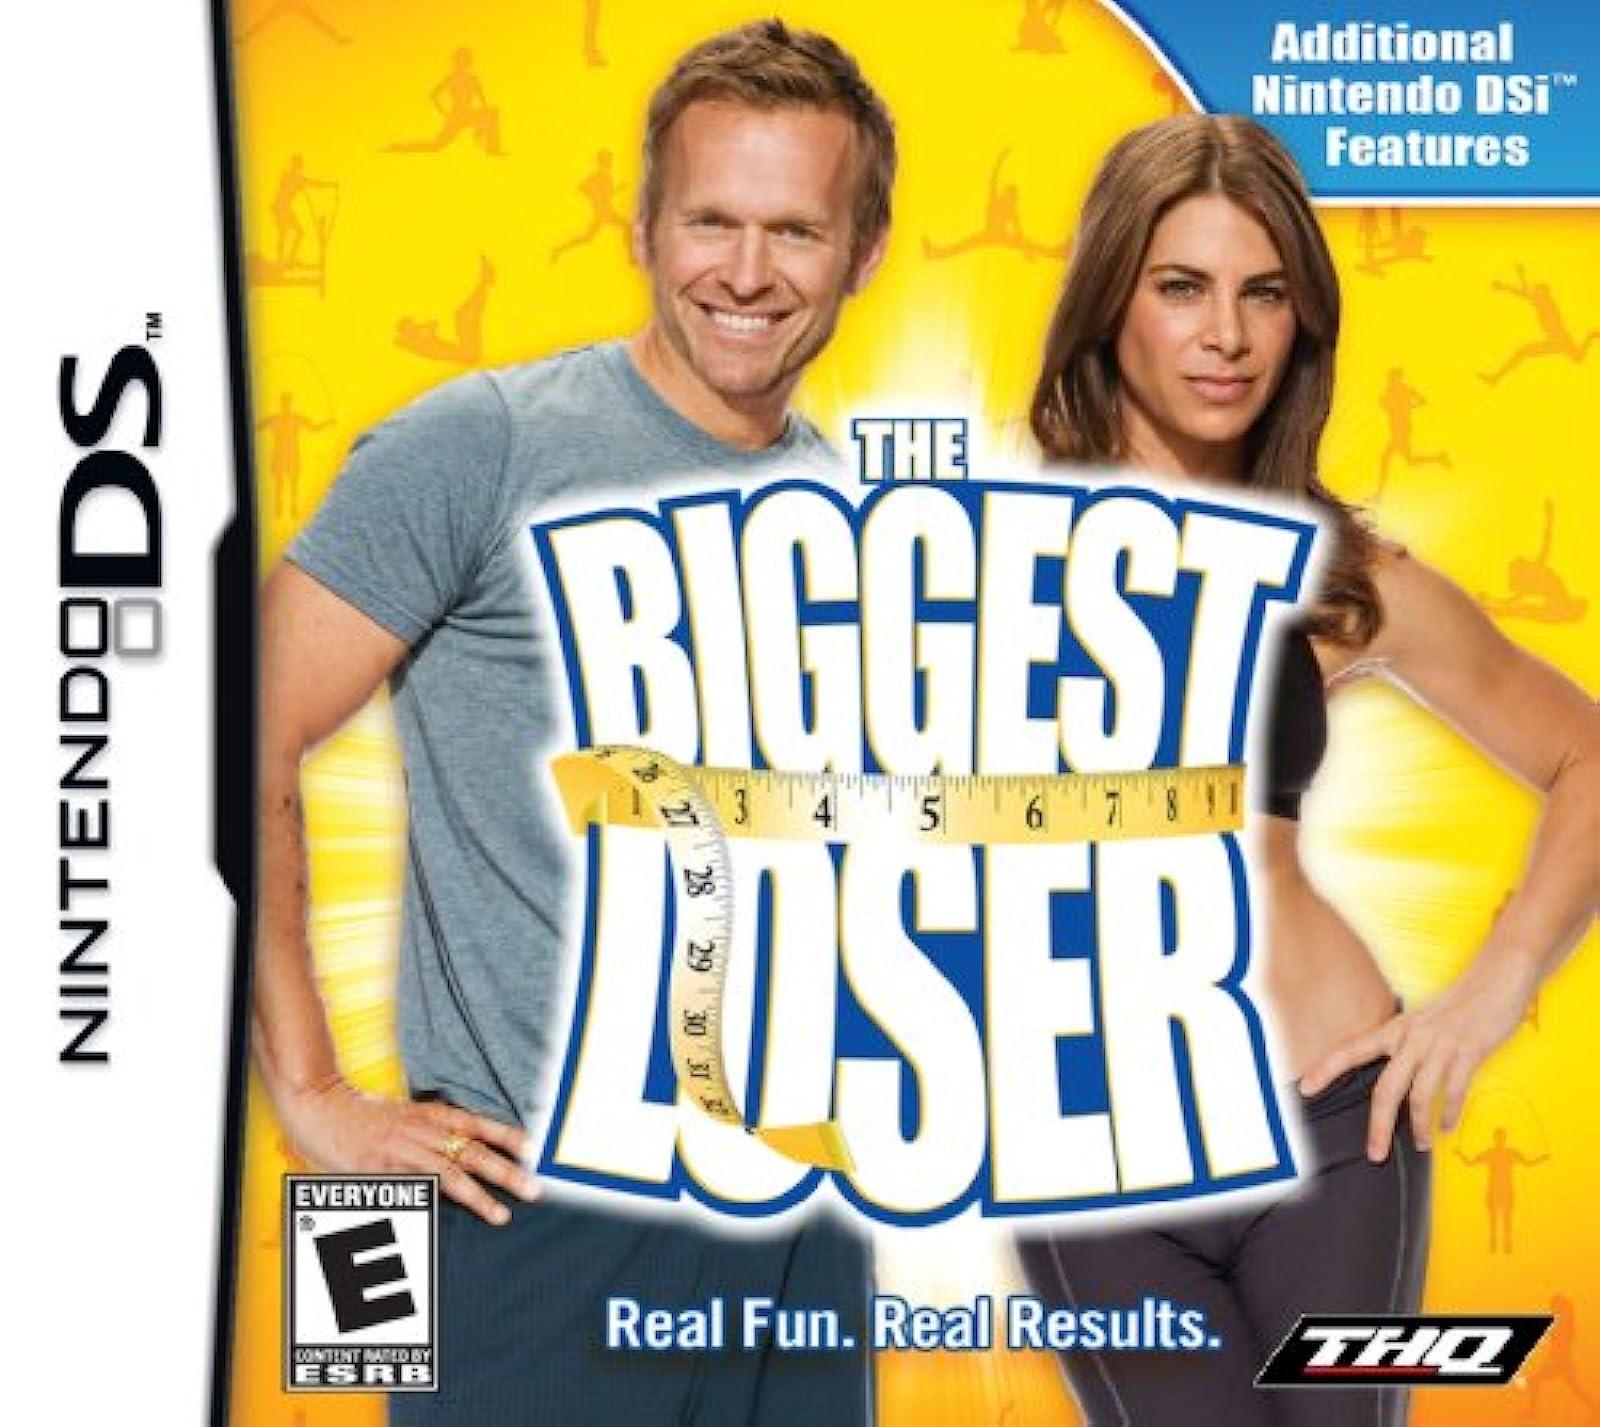 Biggest Loser For Nintendo DS DSi 3DS 2DS